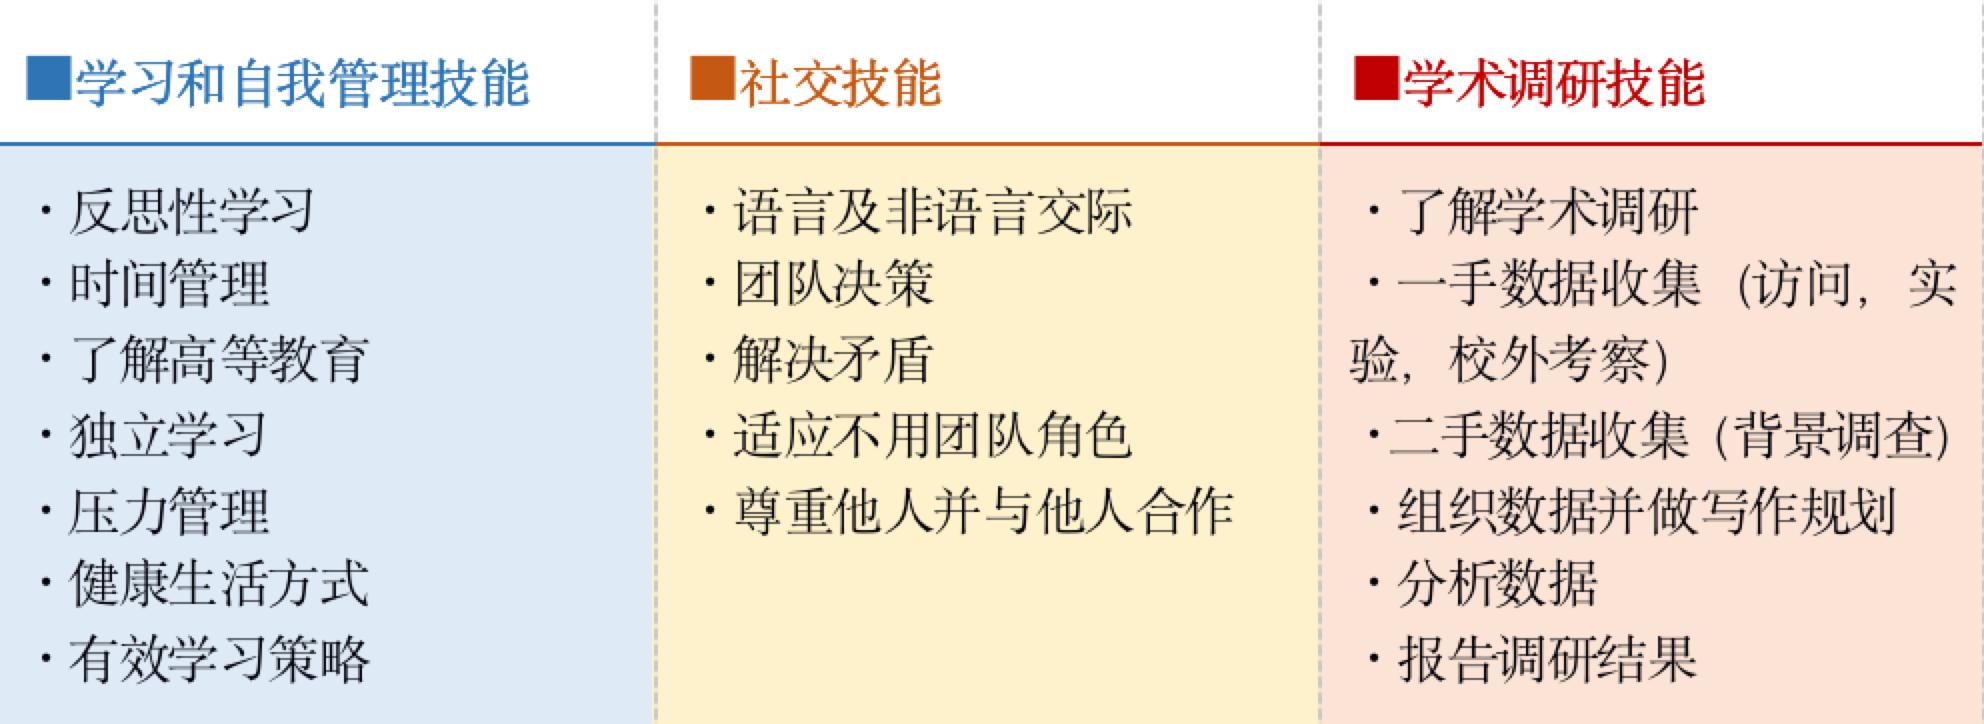 WeChata01d9c599835bfafe5397a57fa5e998a